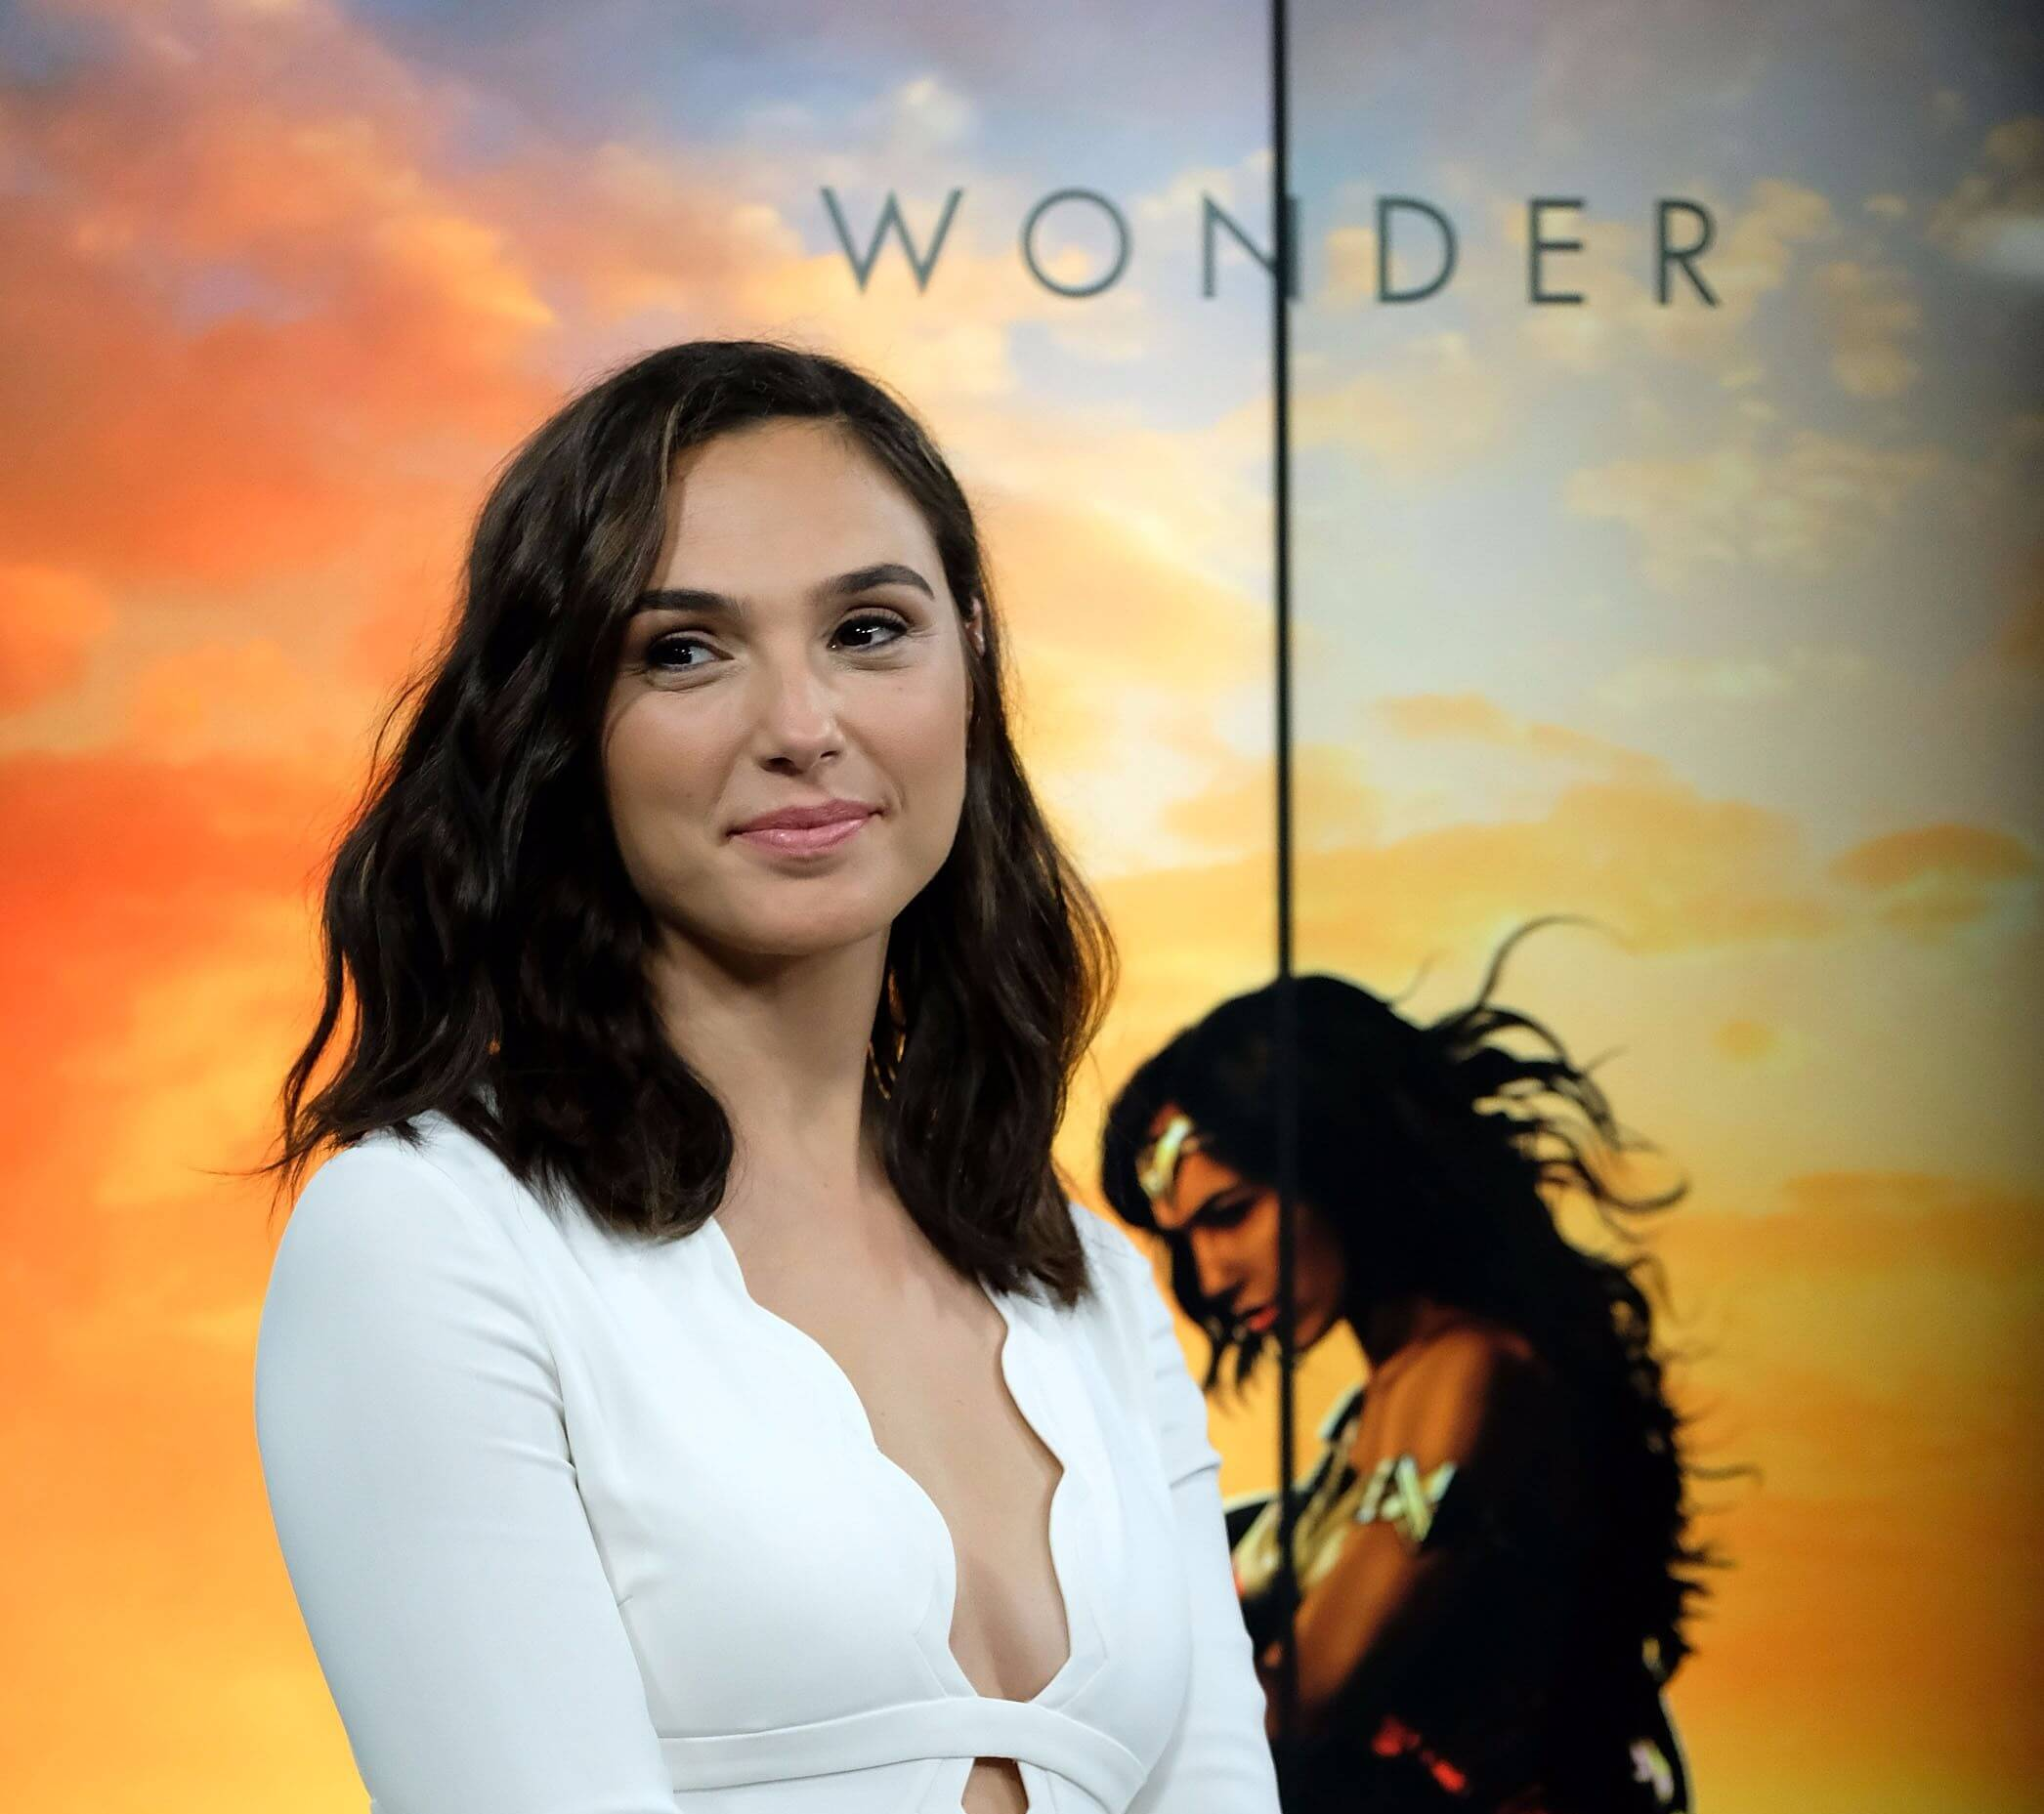 Should Ashkenazi Jews Like Wonder Woman Star Gal Godot Be Considered